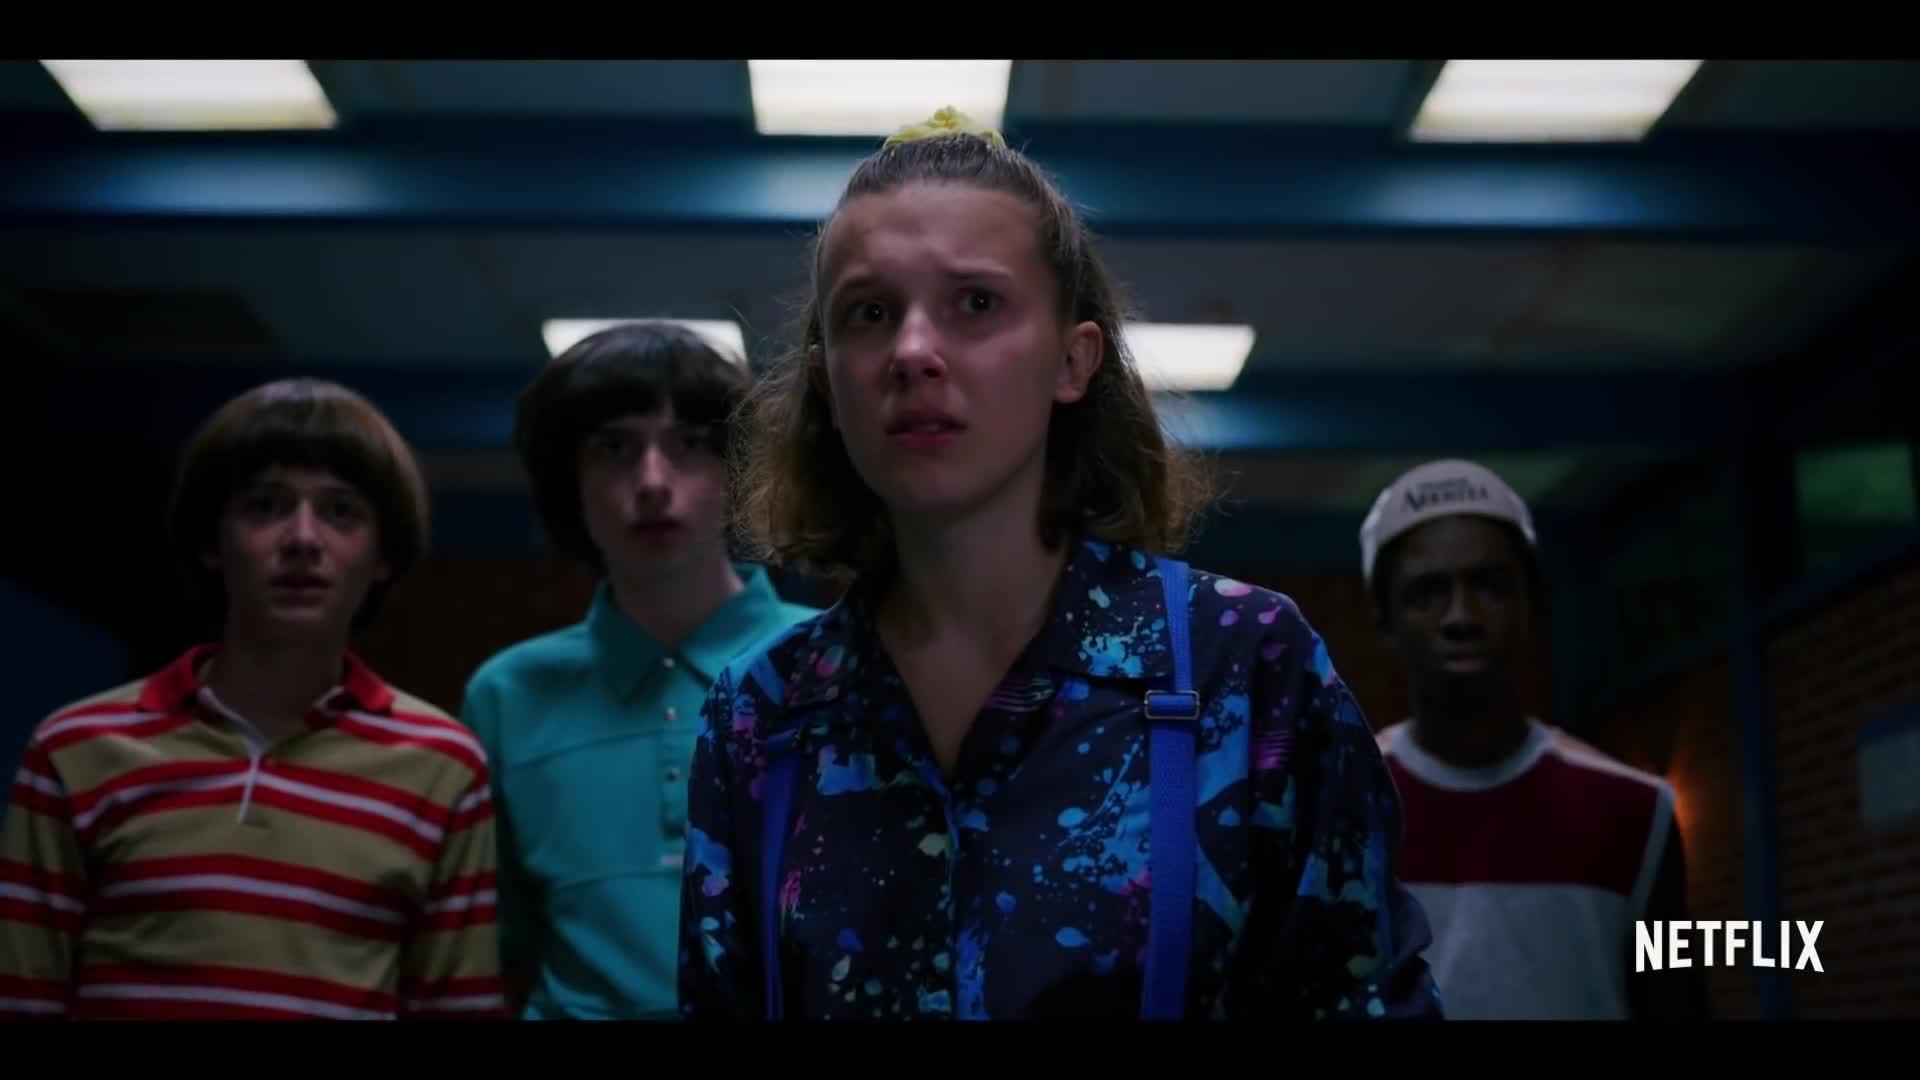 Trailer, Netflix, Serie, Netflix Deutschland, Stranger Things